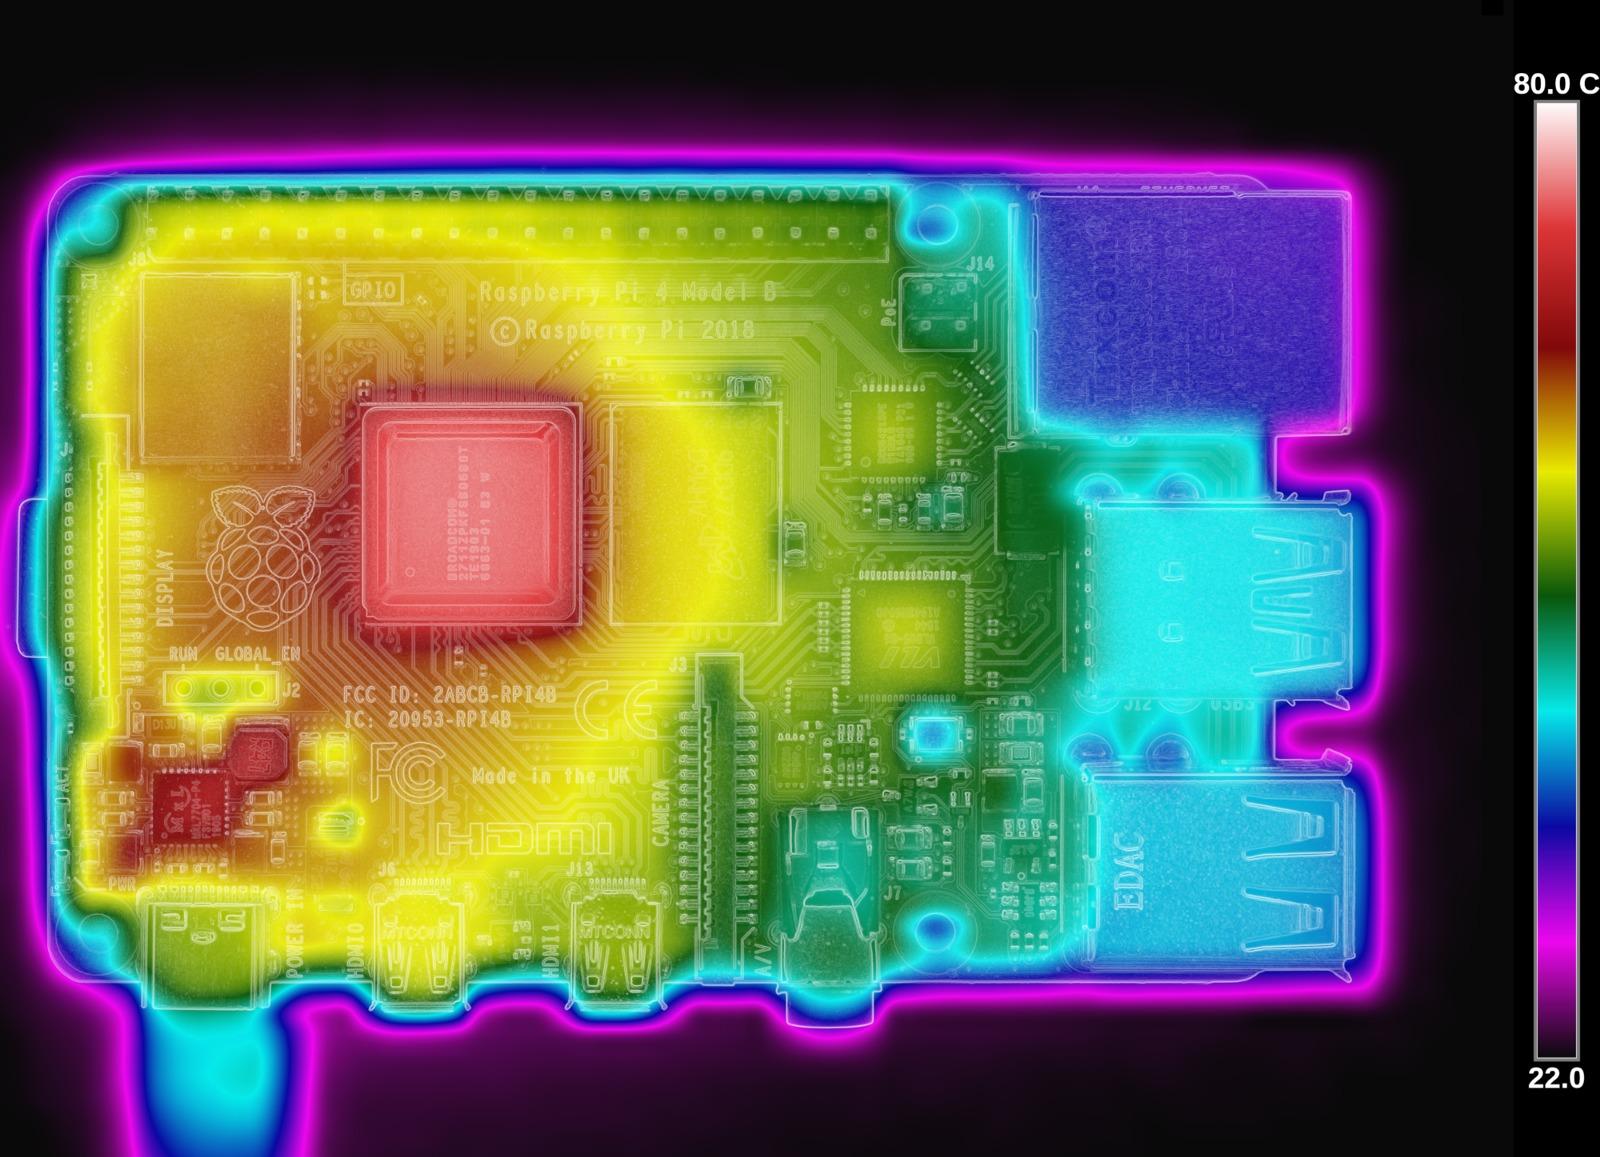 Benchmarking the Raspberry Pi 4